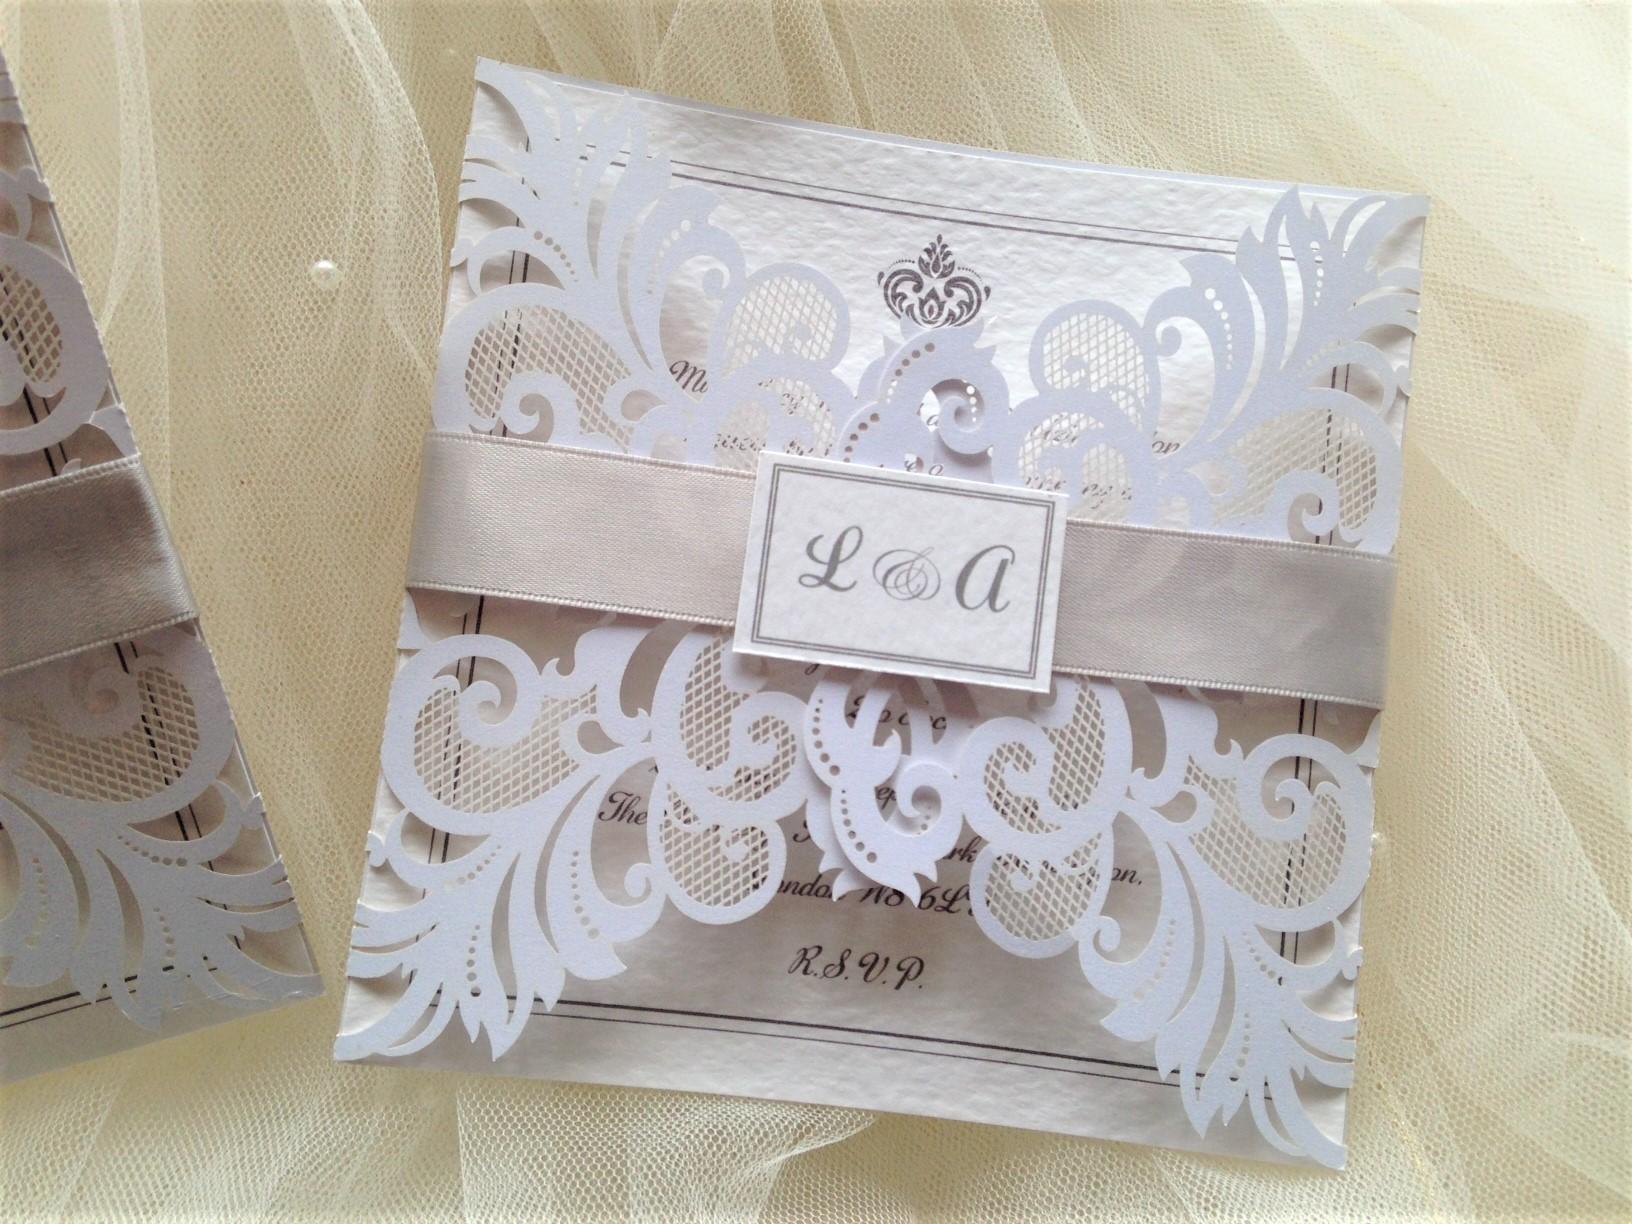 Personalised wedding invitations - Daisy Chain Invites